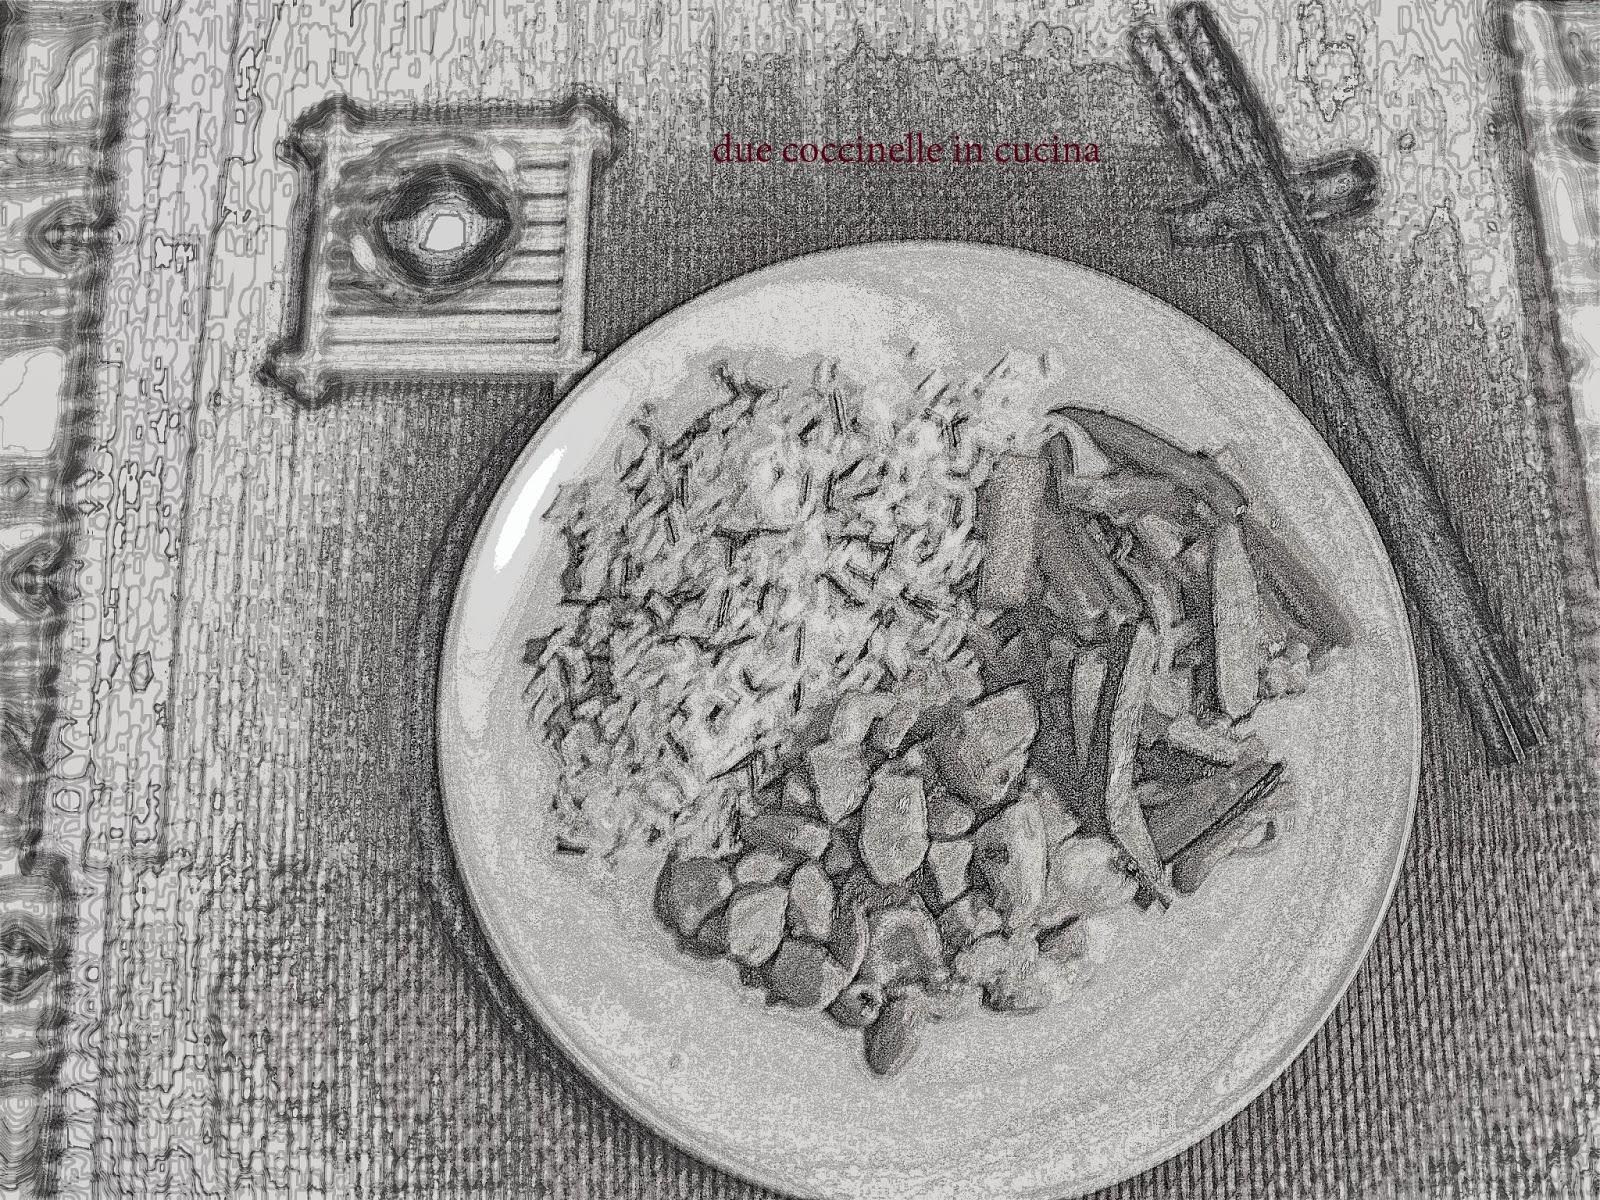 due coccinelle in cucina  Dal Mondo  Pollo alle mandorle con verdure saltate 230f51c0daec